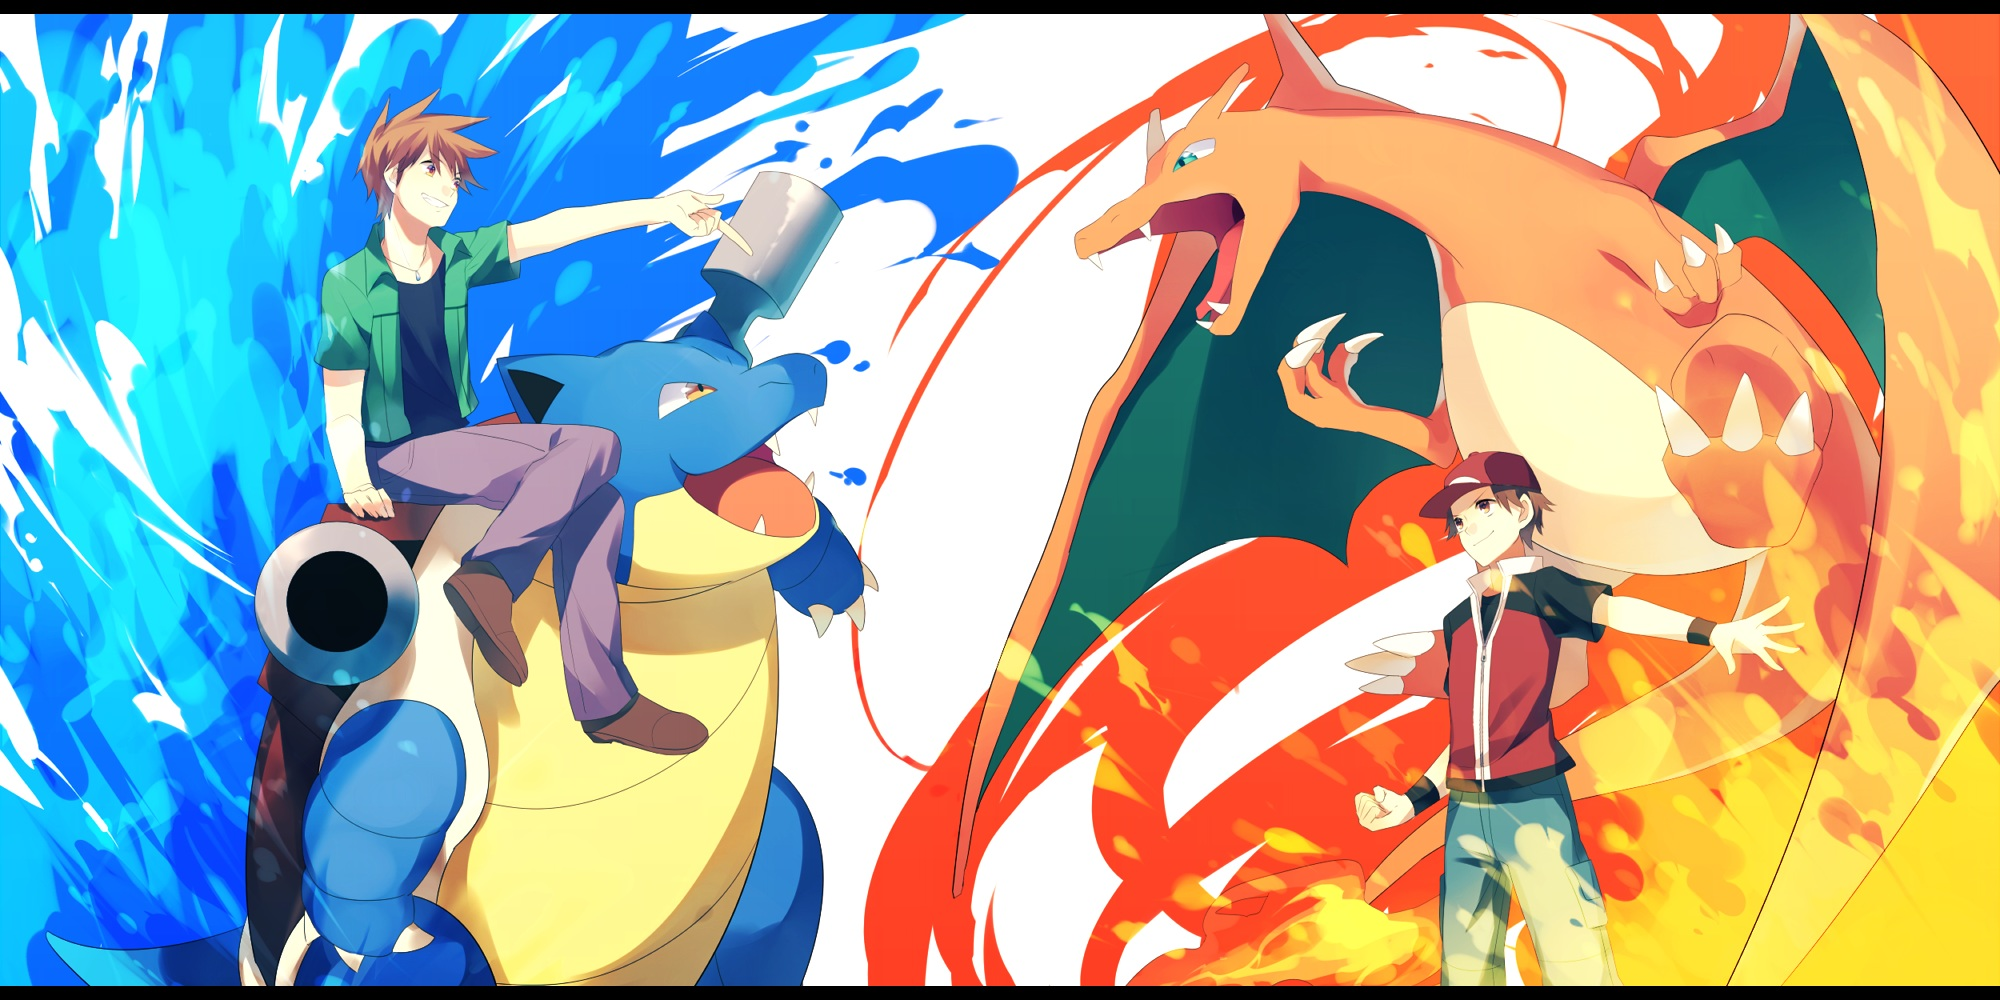 Pokemon Achiki Blastoise Charizard Fire Hat Ookido Green Pokemon Red Pokemon Water Wallpaper